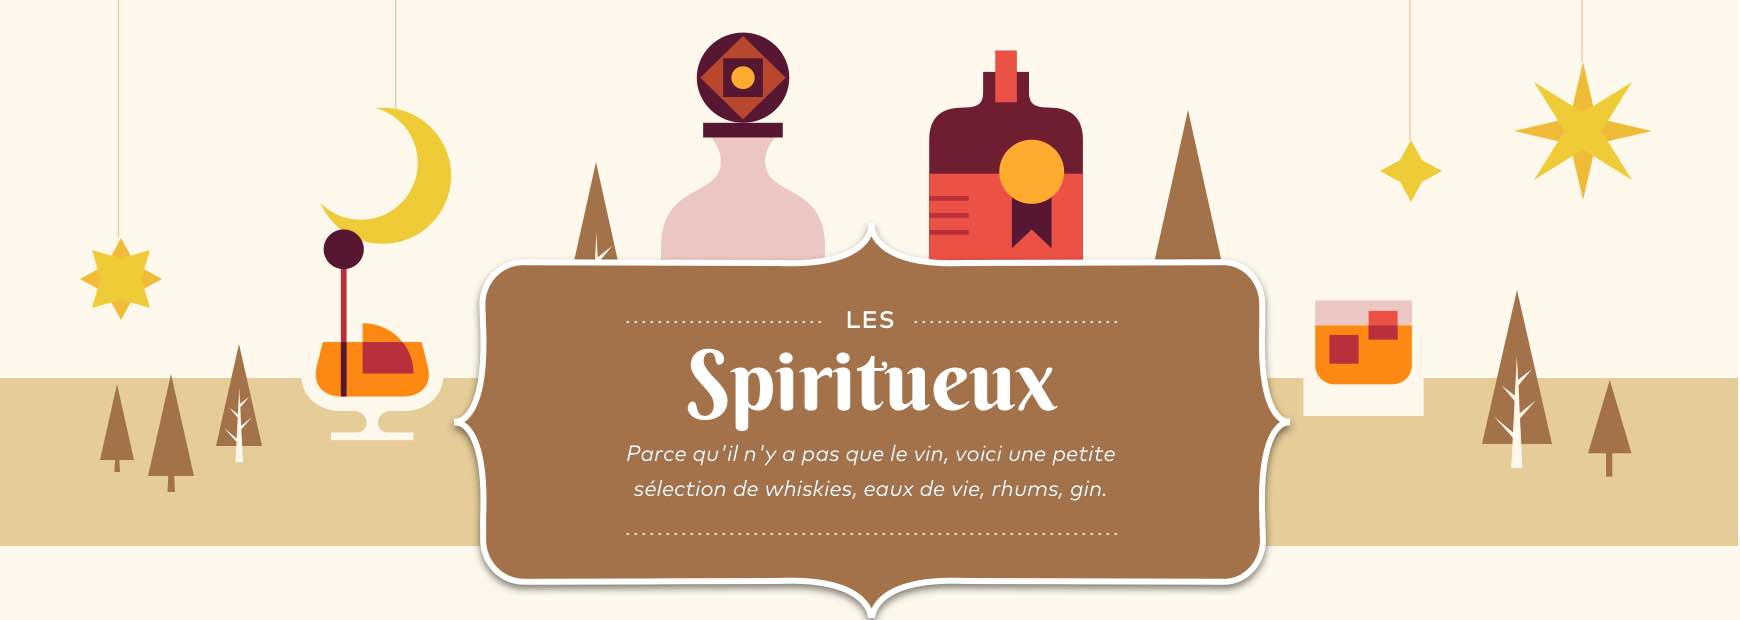 Spiritueux